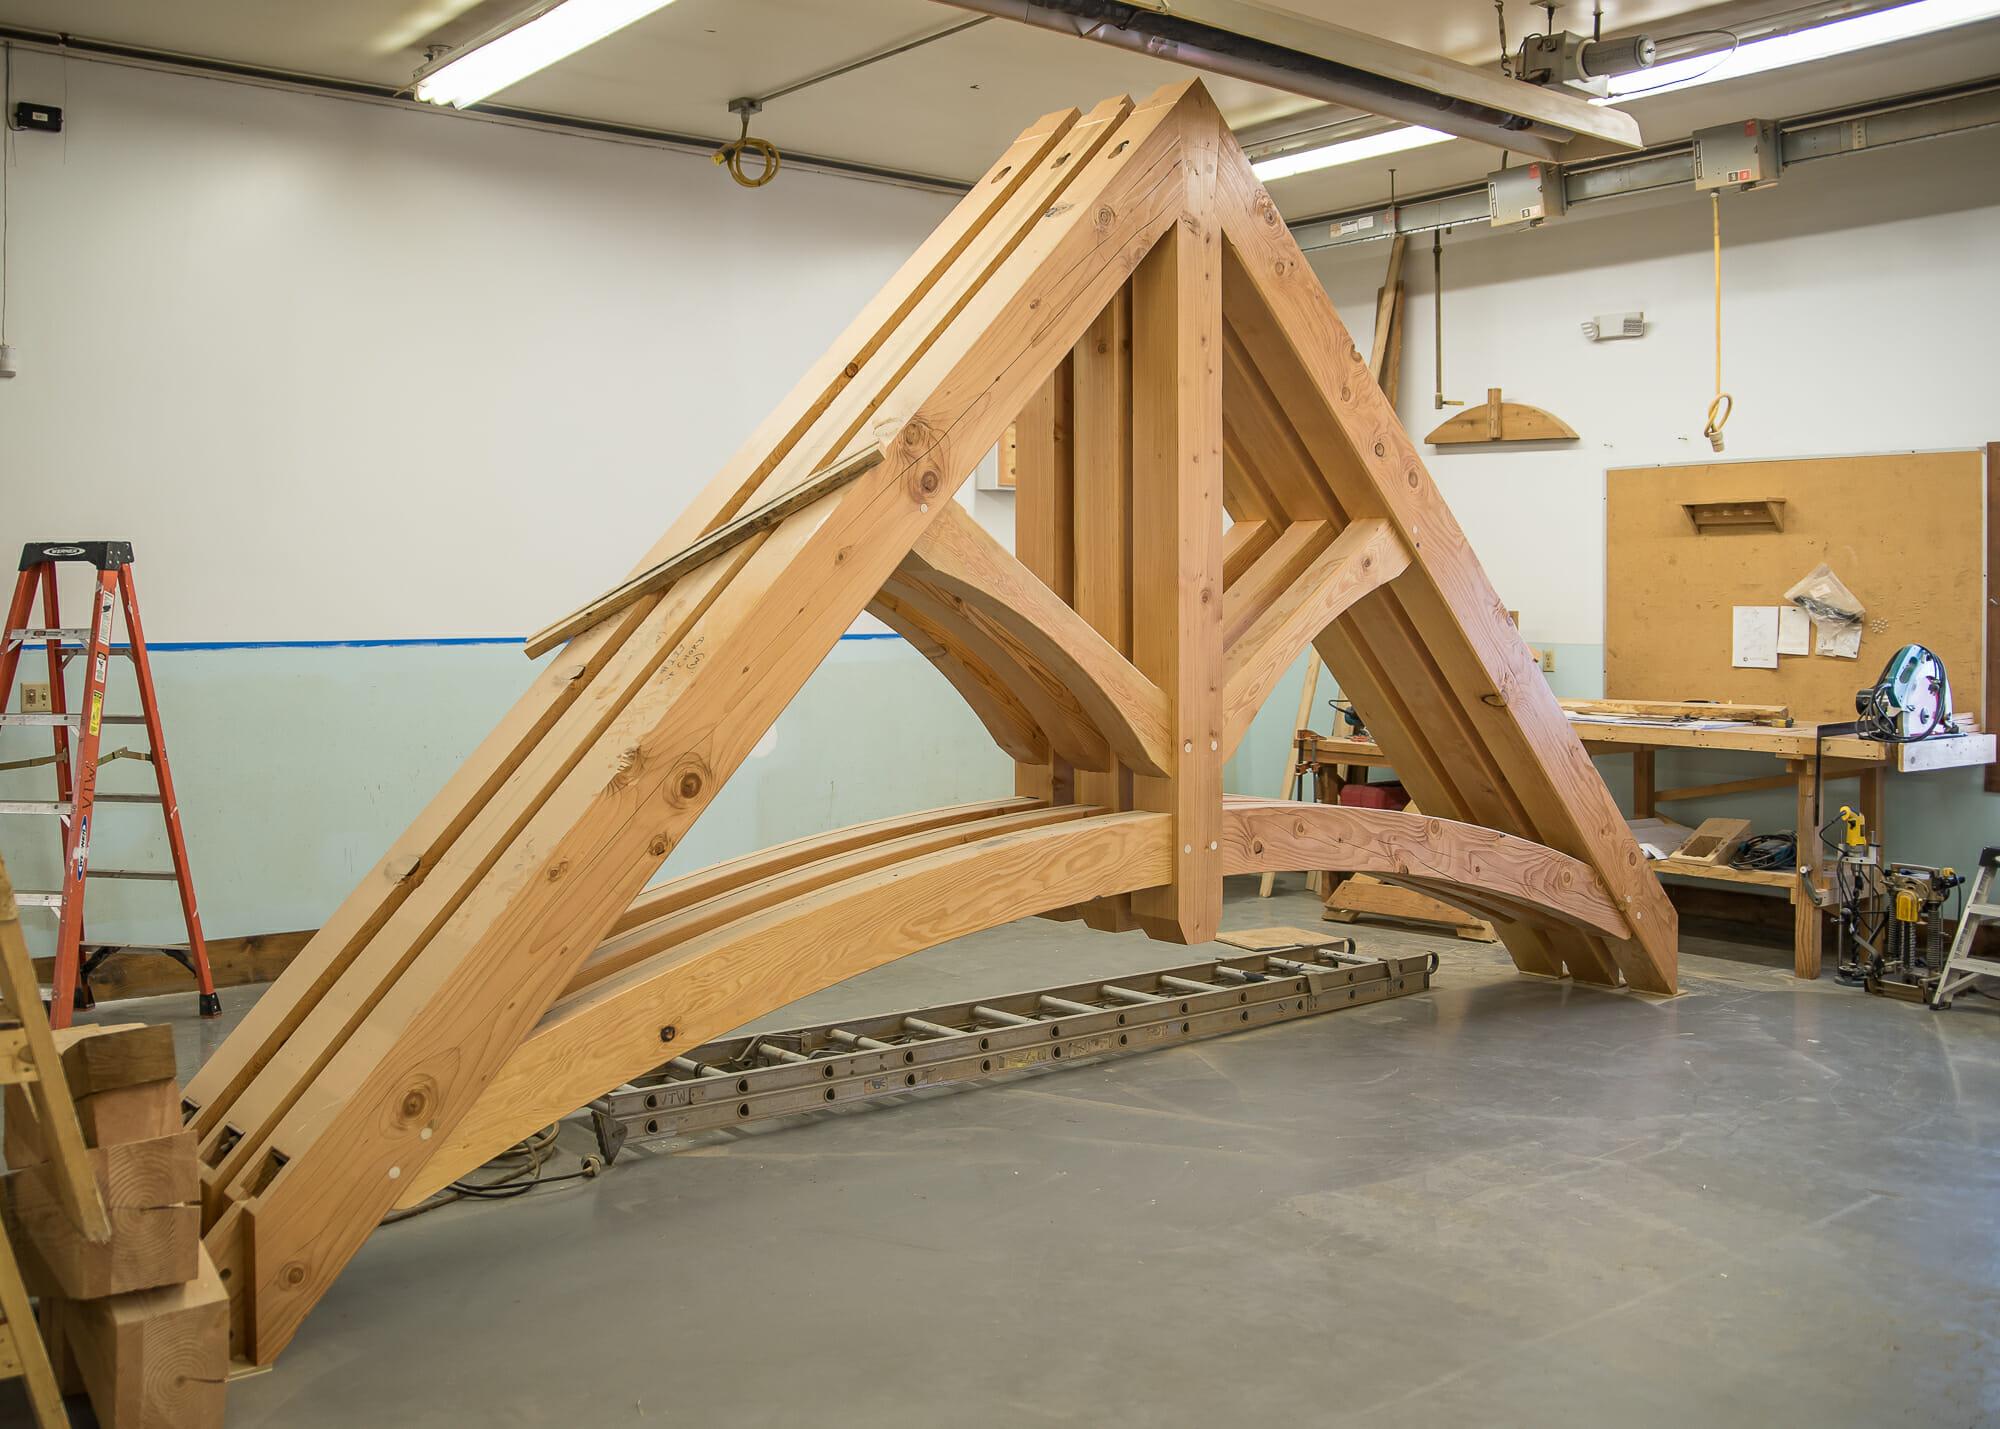 King Post Trusses | Timber Frame Design | Wood Ceiling Beams